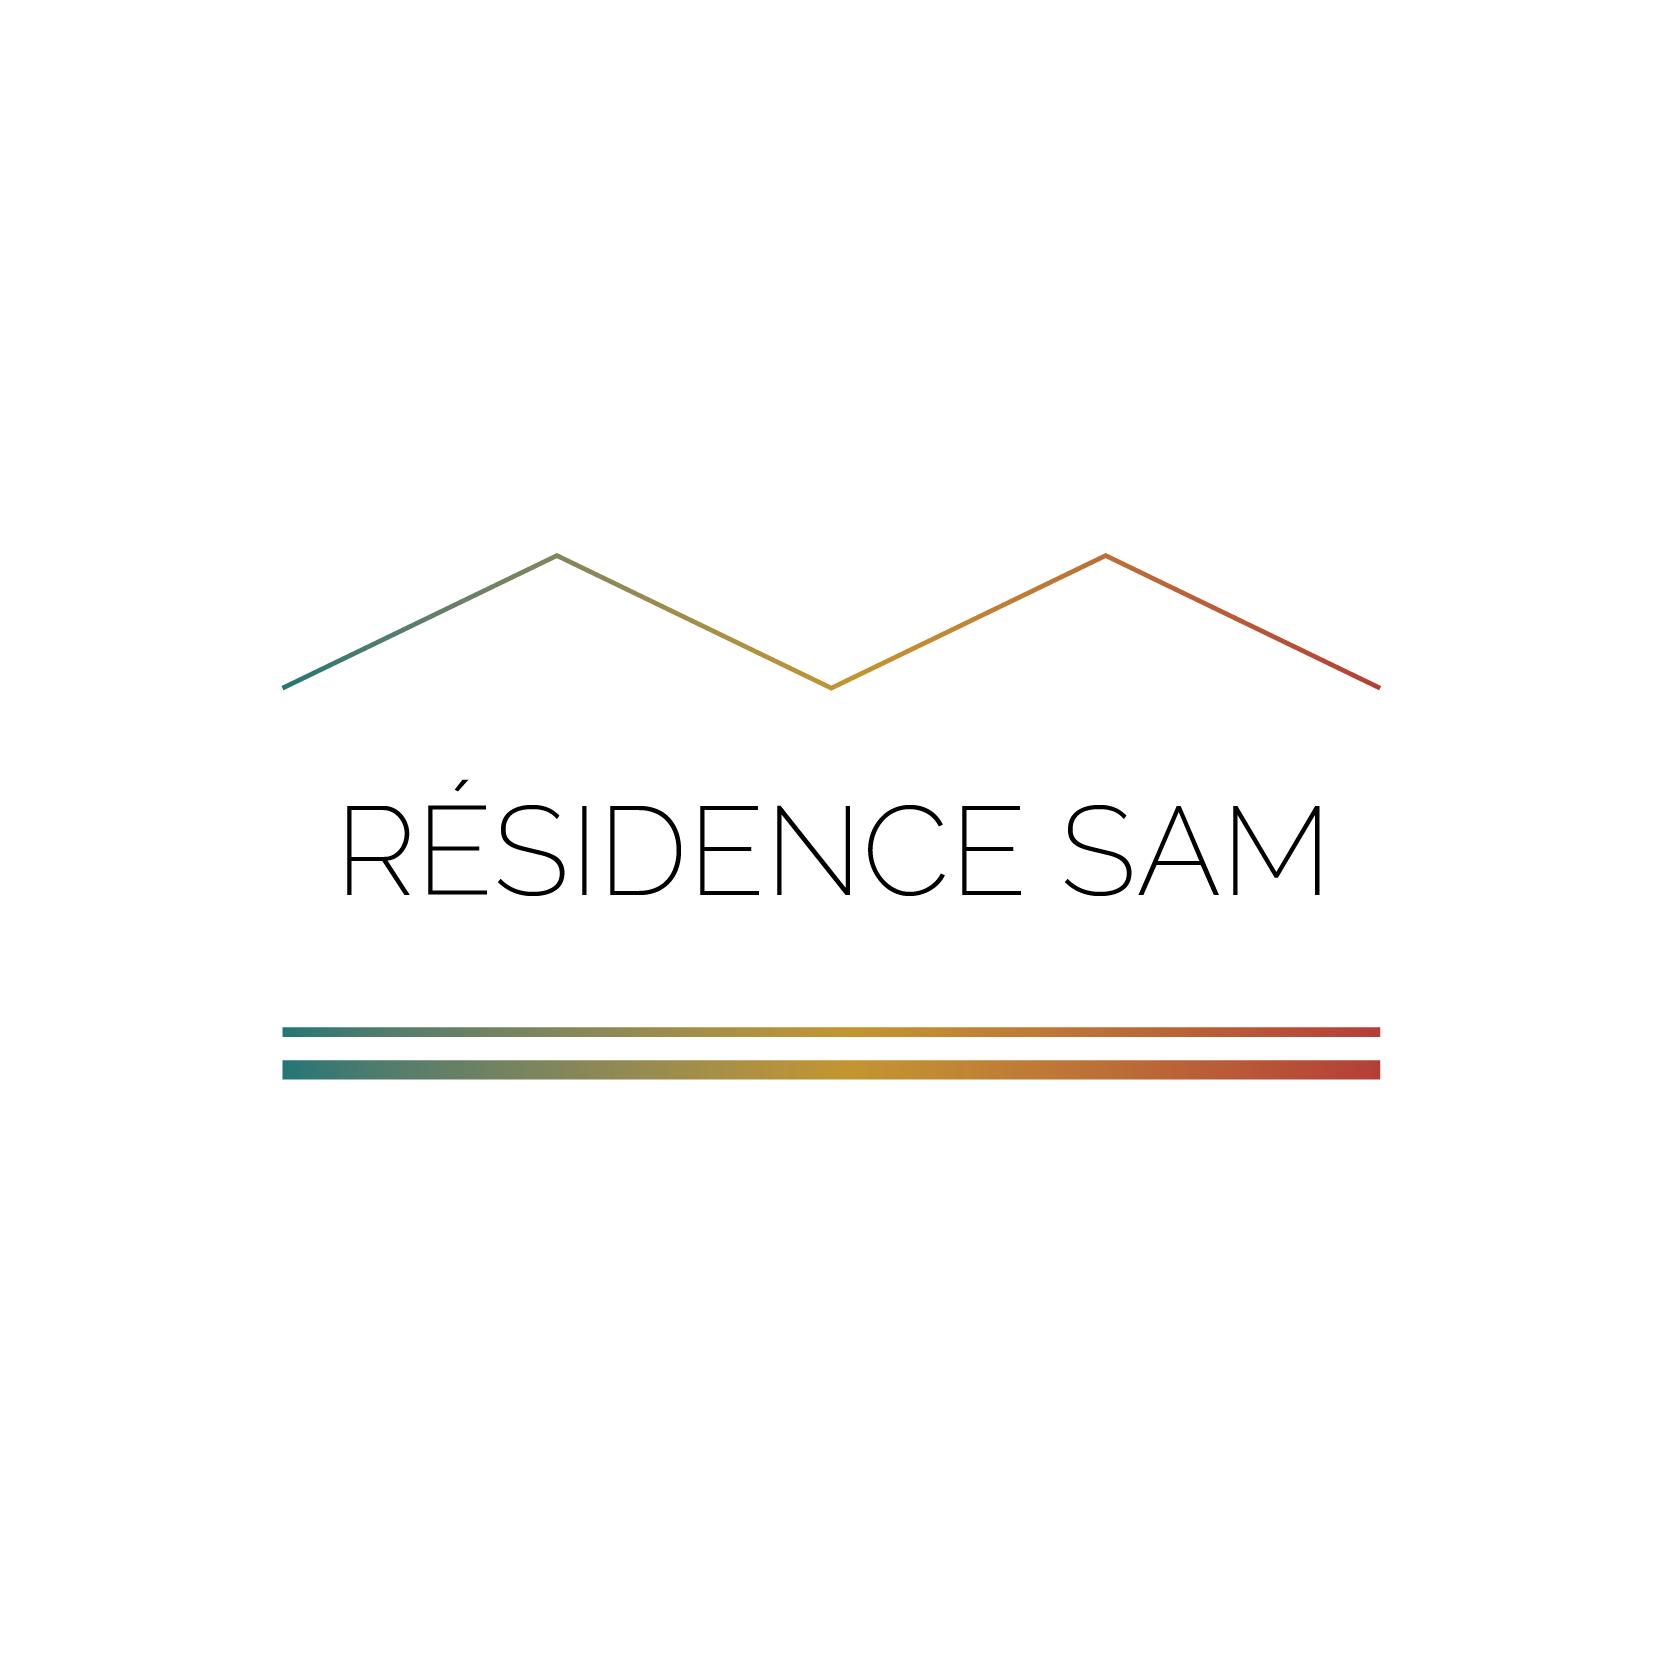 SAM 2017 RESIDENTS